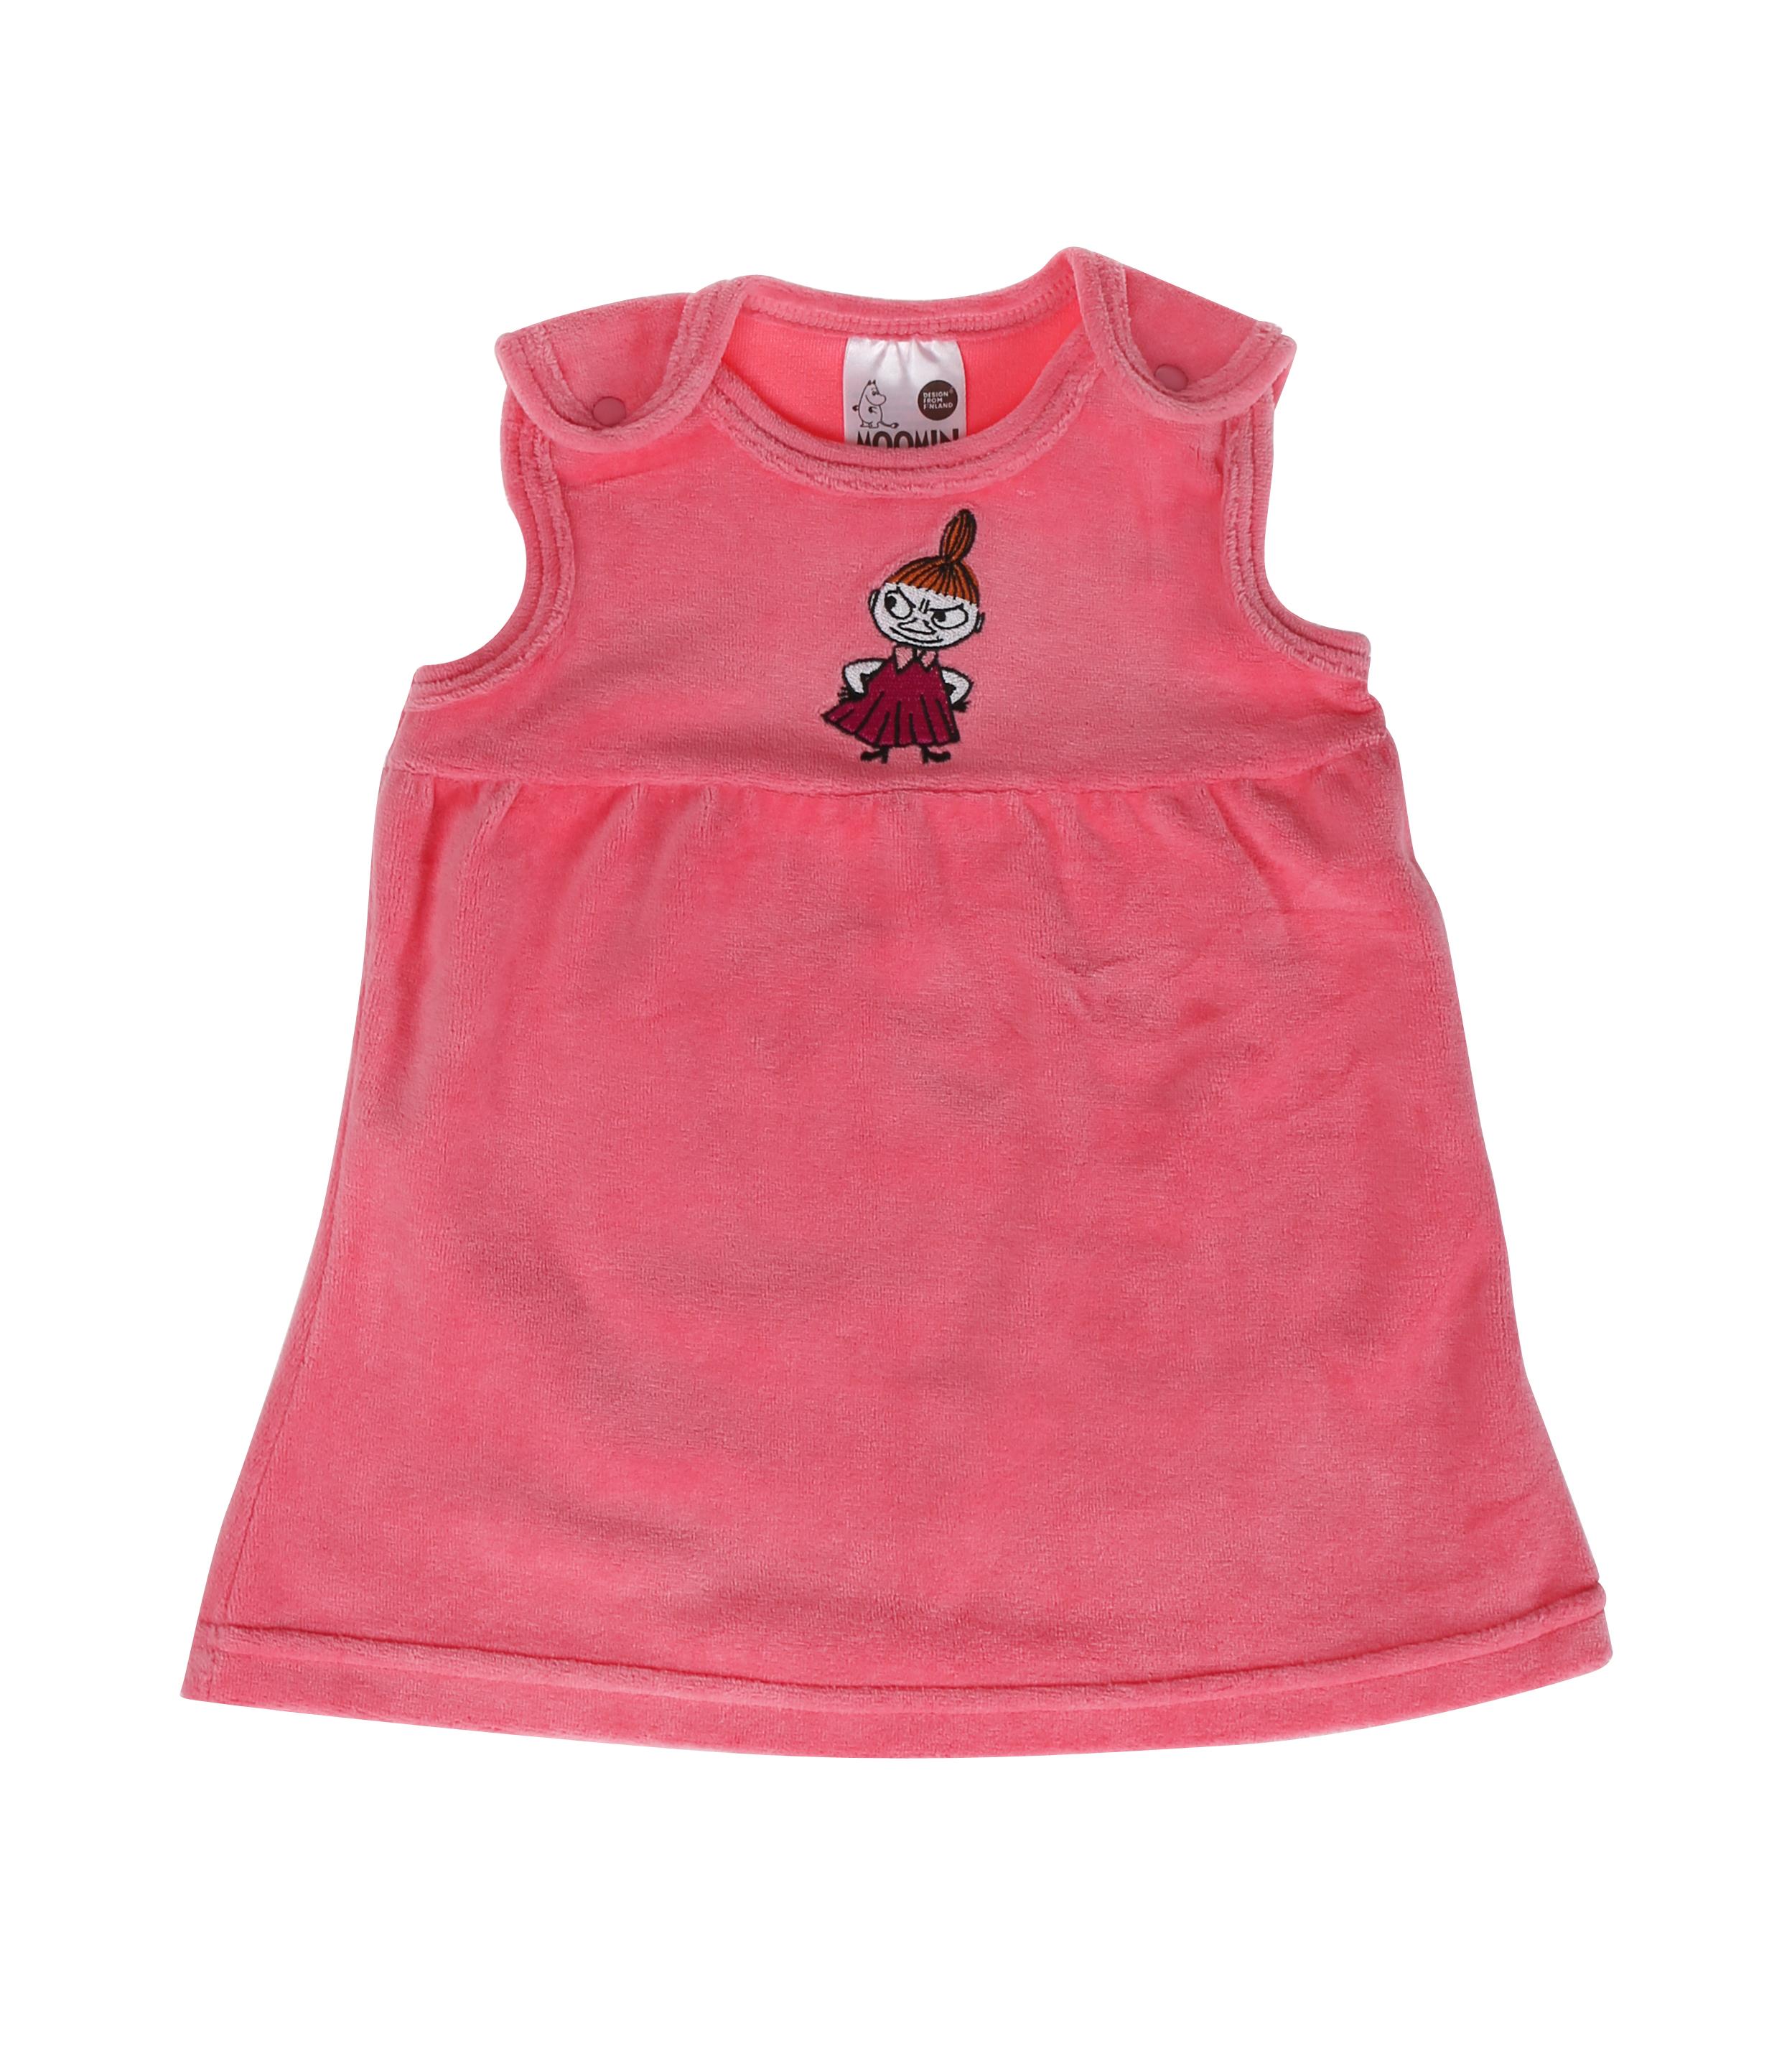 Martinex Little My dress